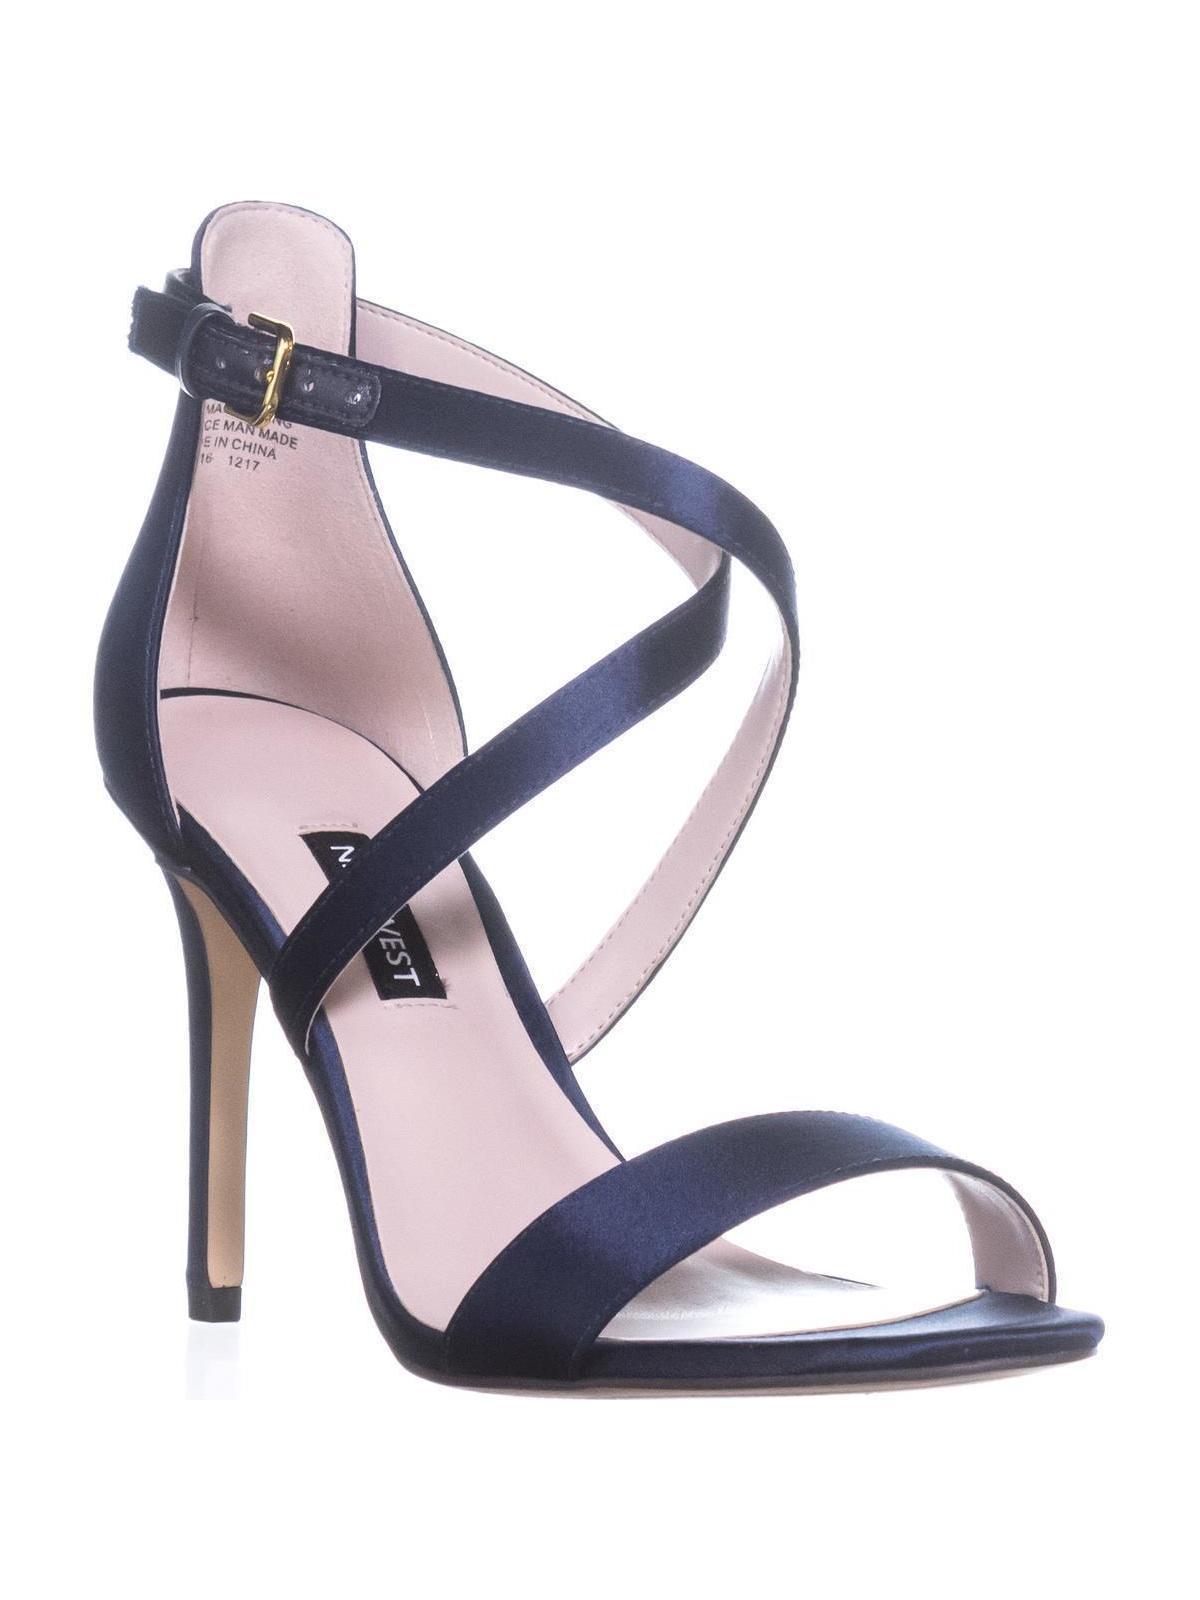 8c8cc7bf4b12 Nine West Mydebut Dress Heel Sandals